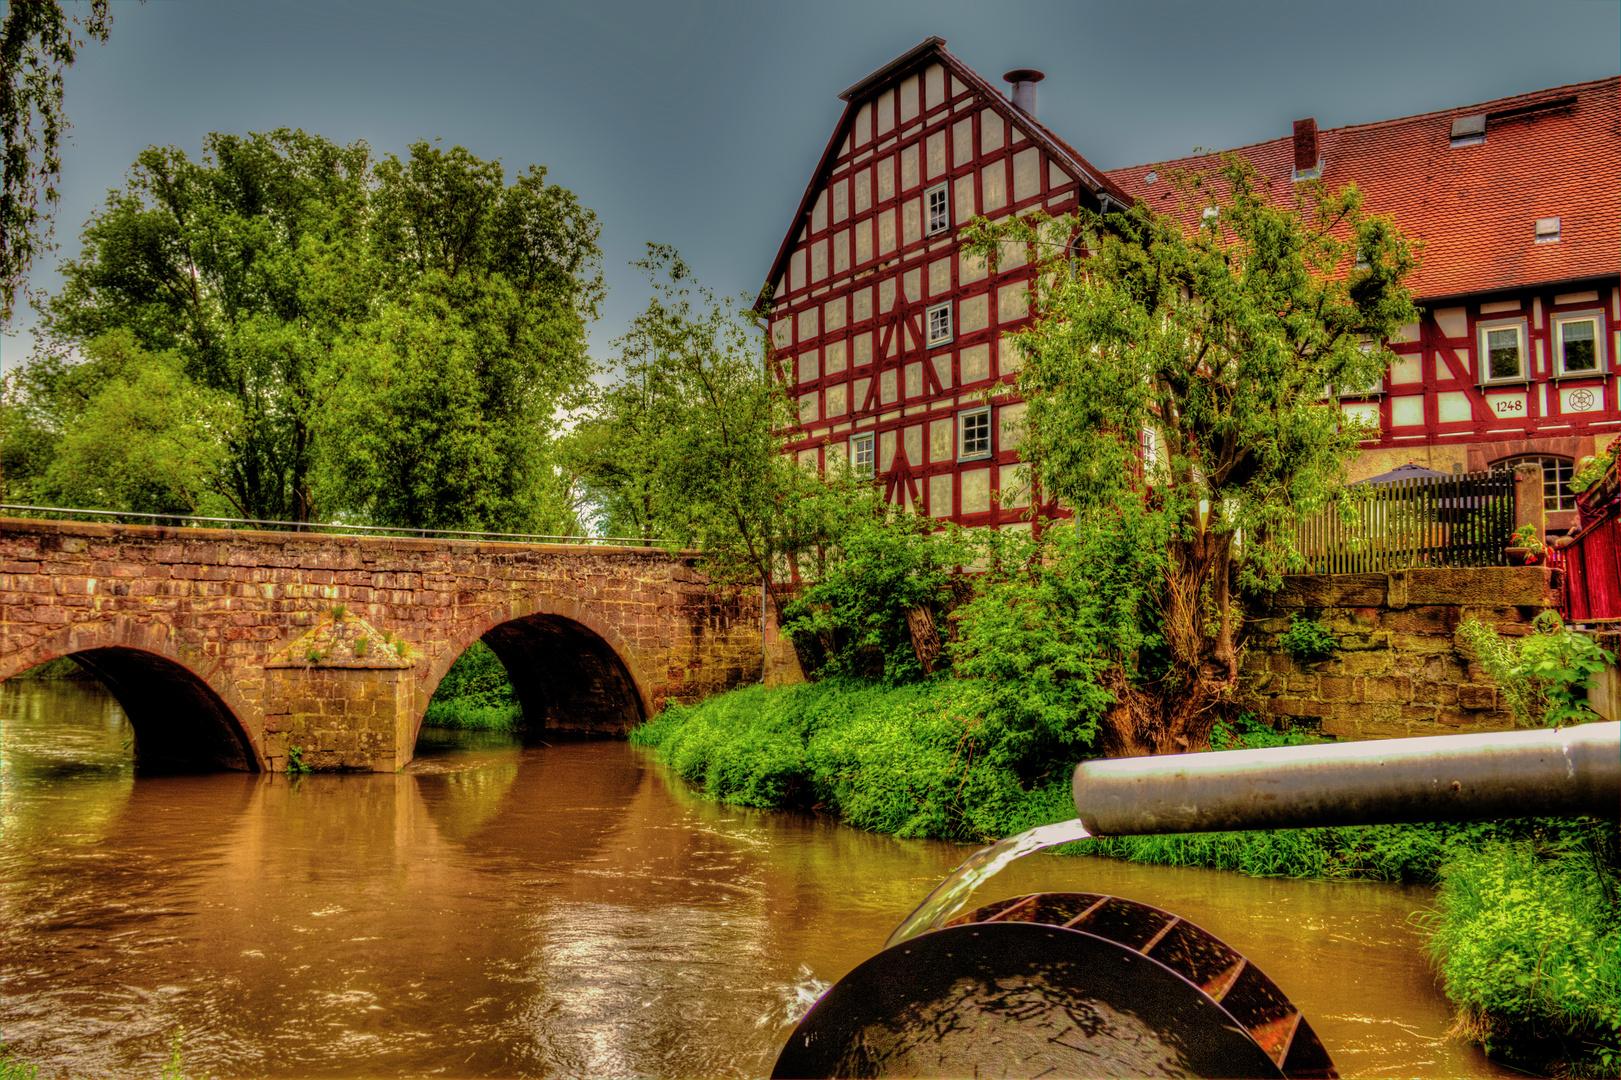 Brücker Mühle